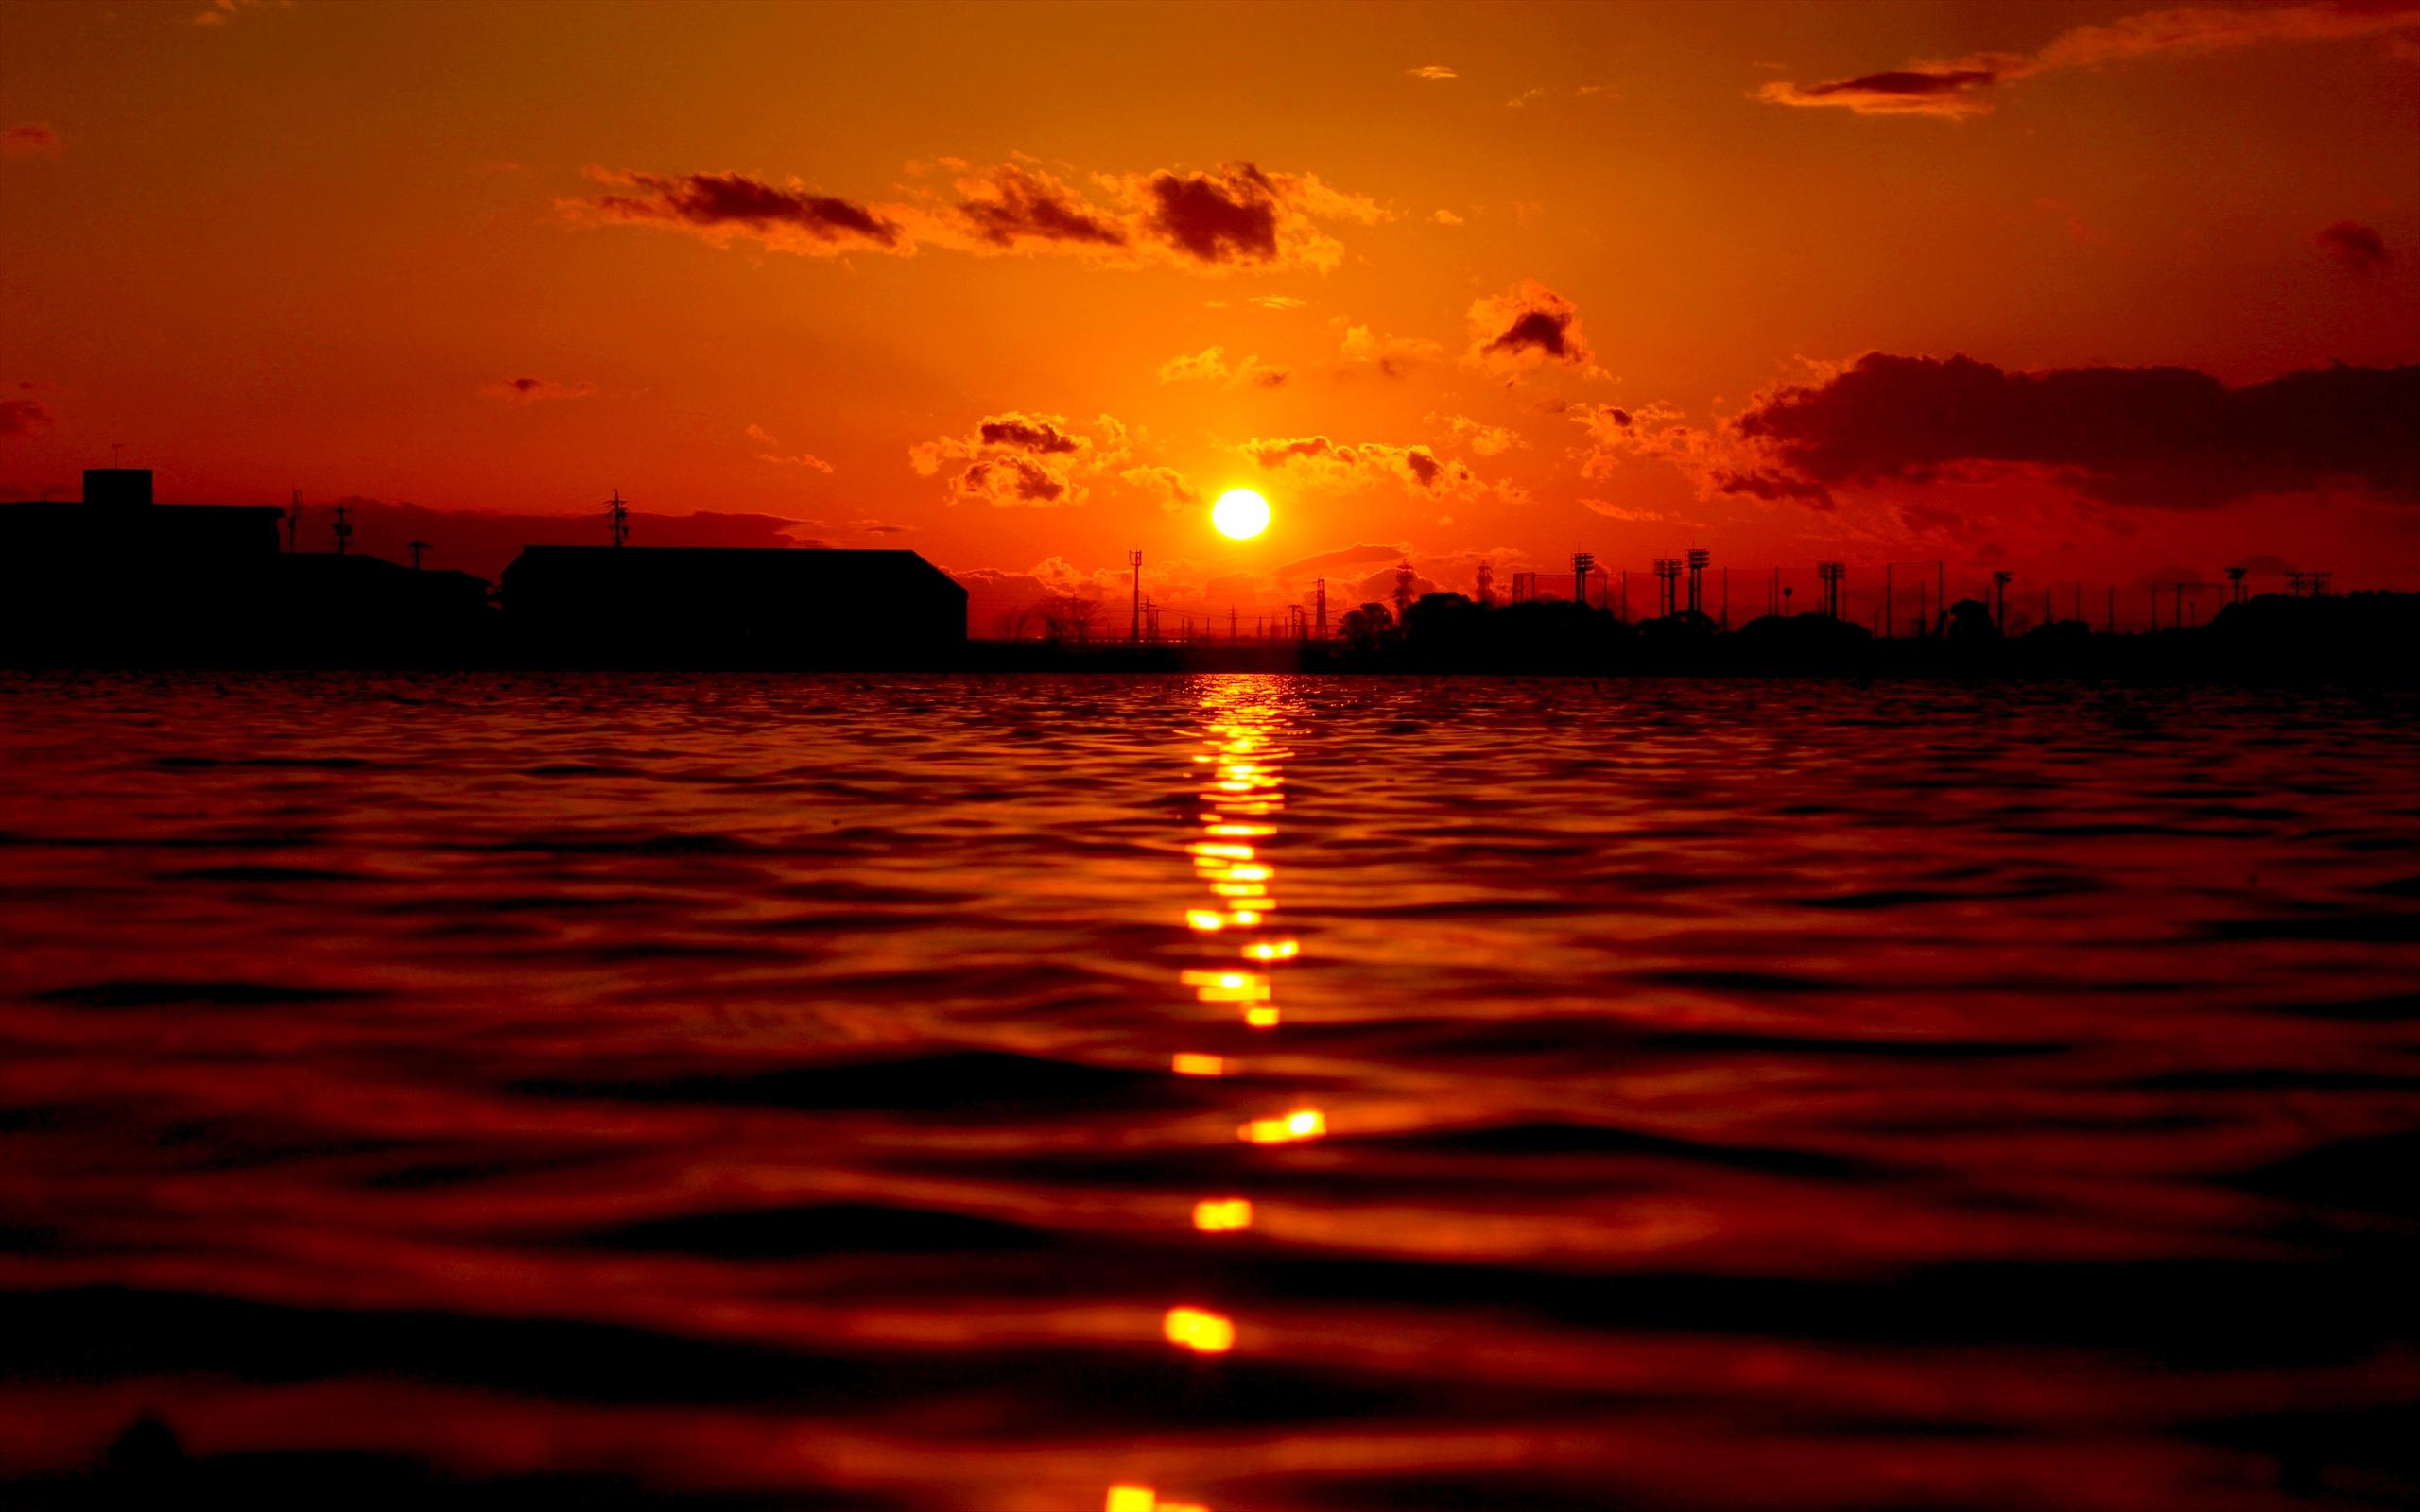 red evening sun